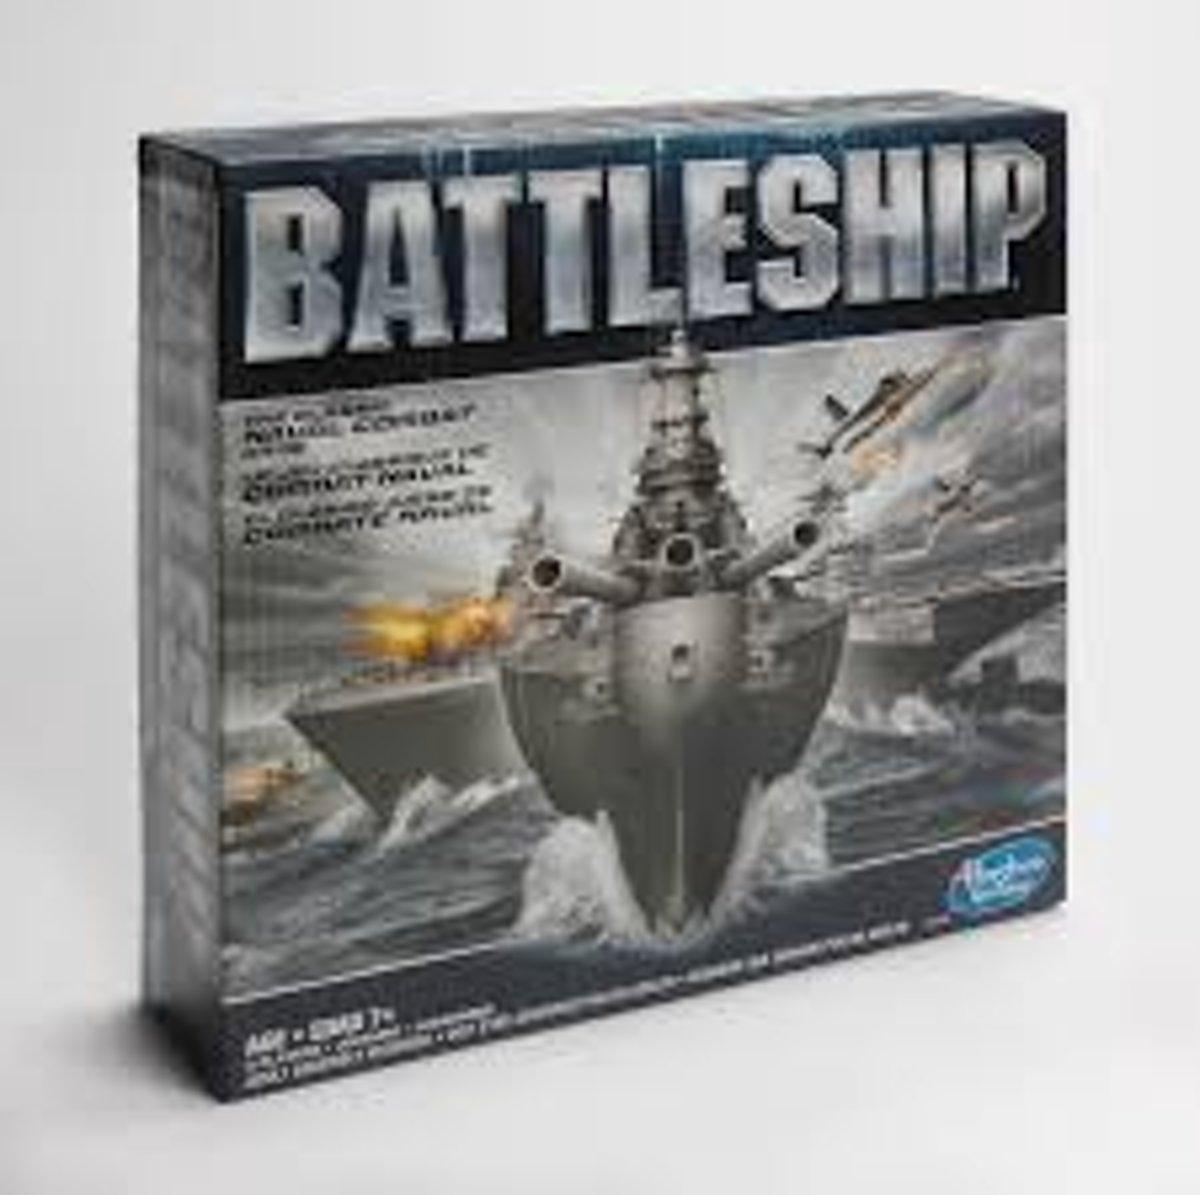 Battleship /Toys